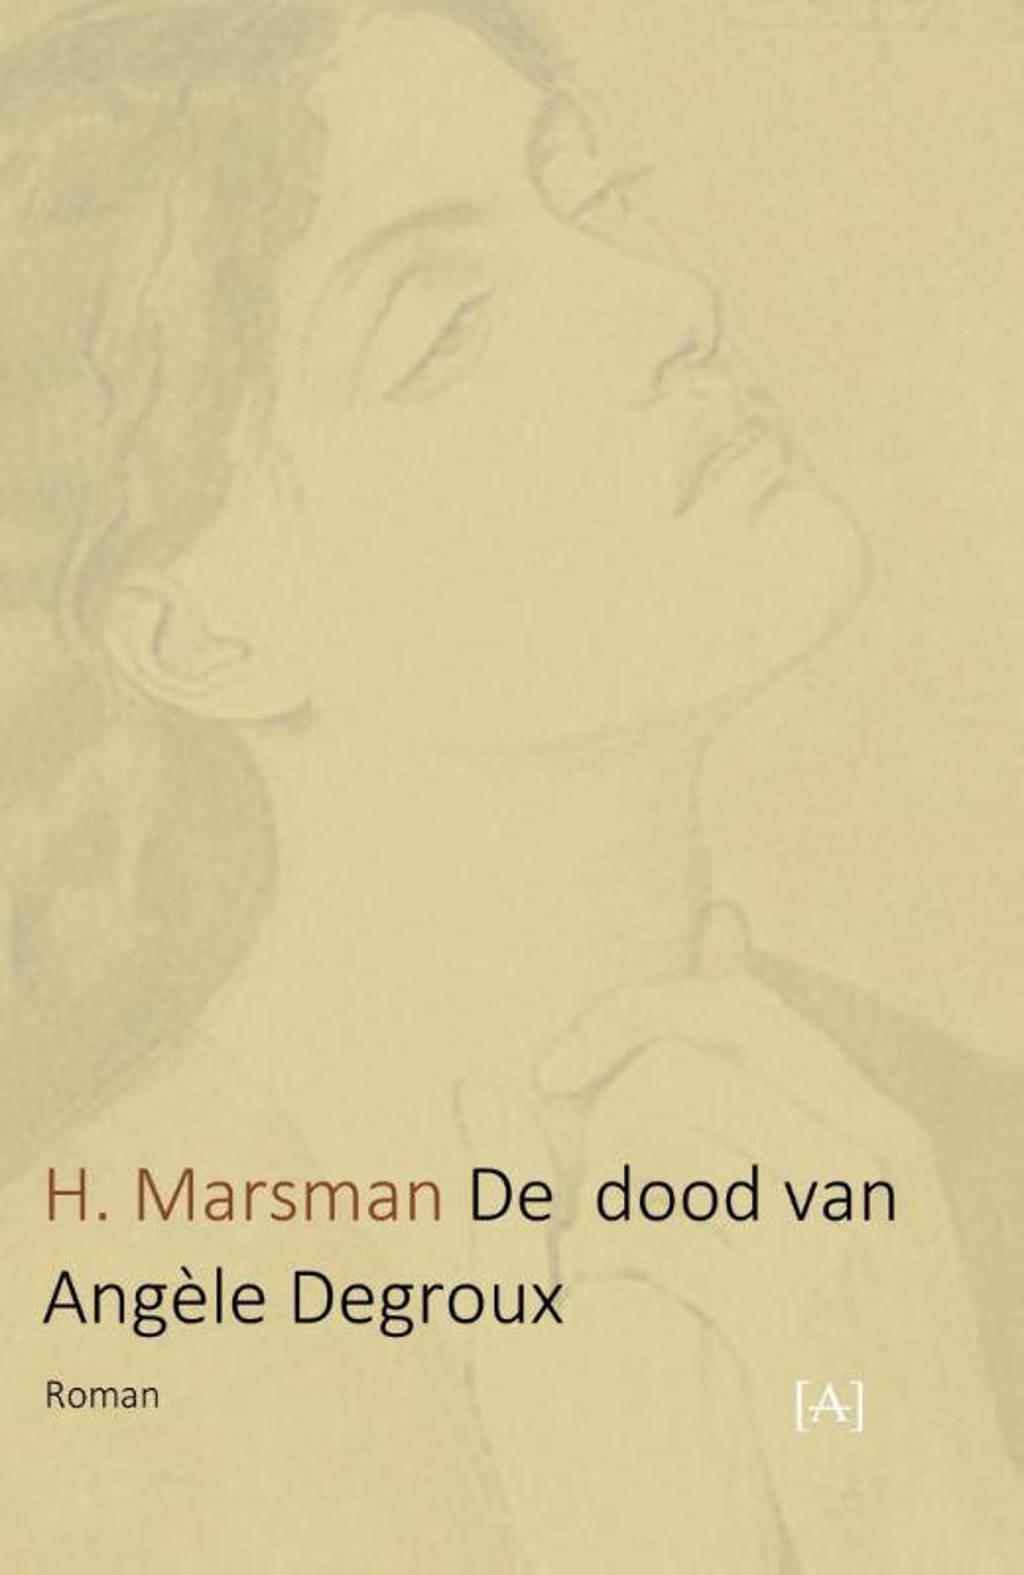 De dood van Angèle Degroux - H Marsman